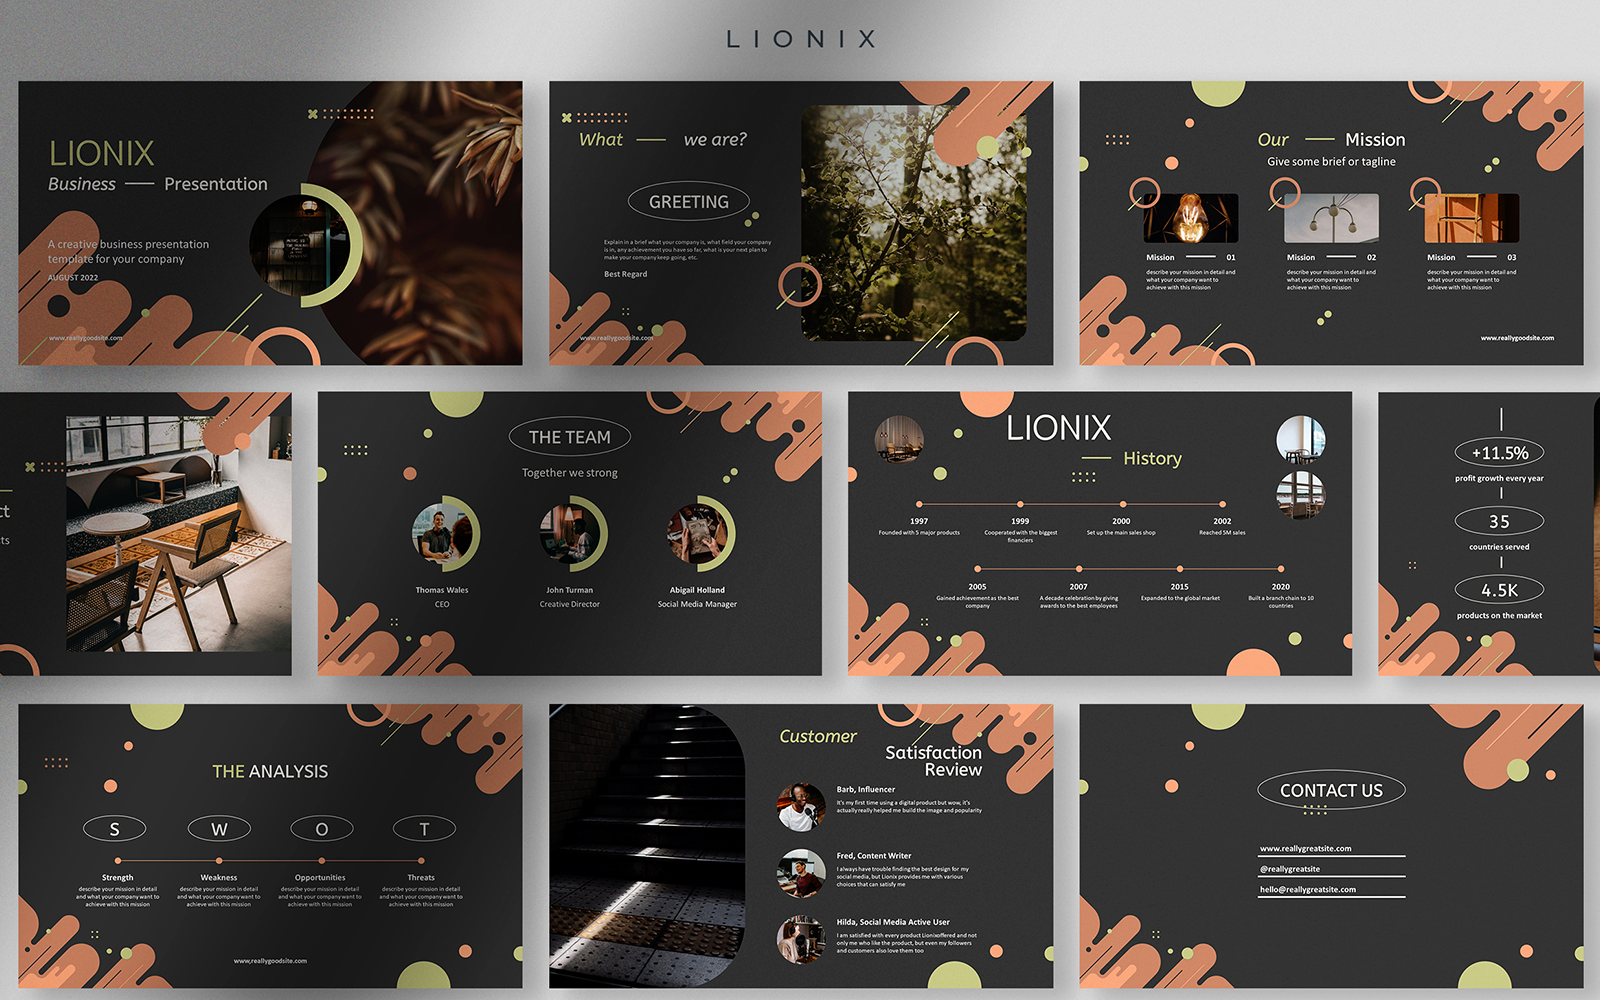 Lionix - Fun in The Dark Creative Business Presentation